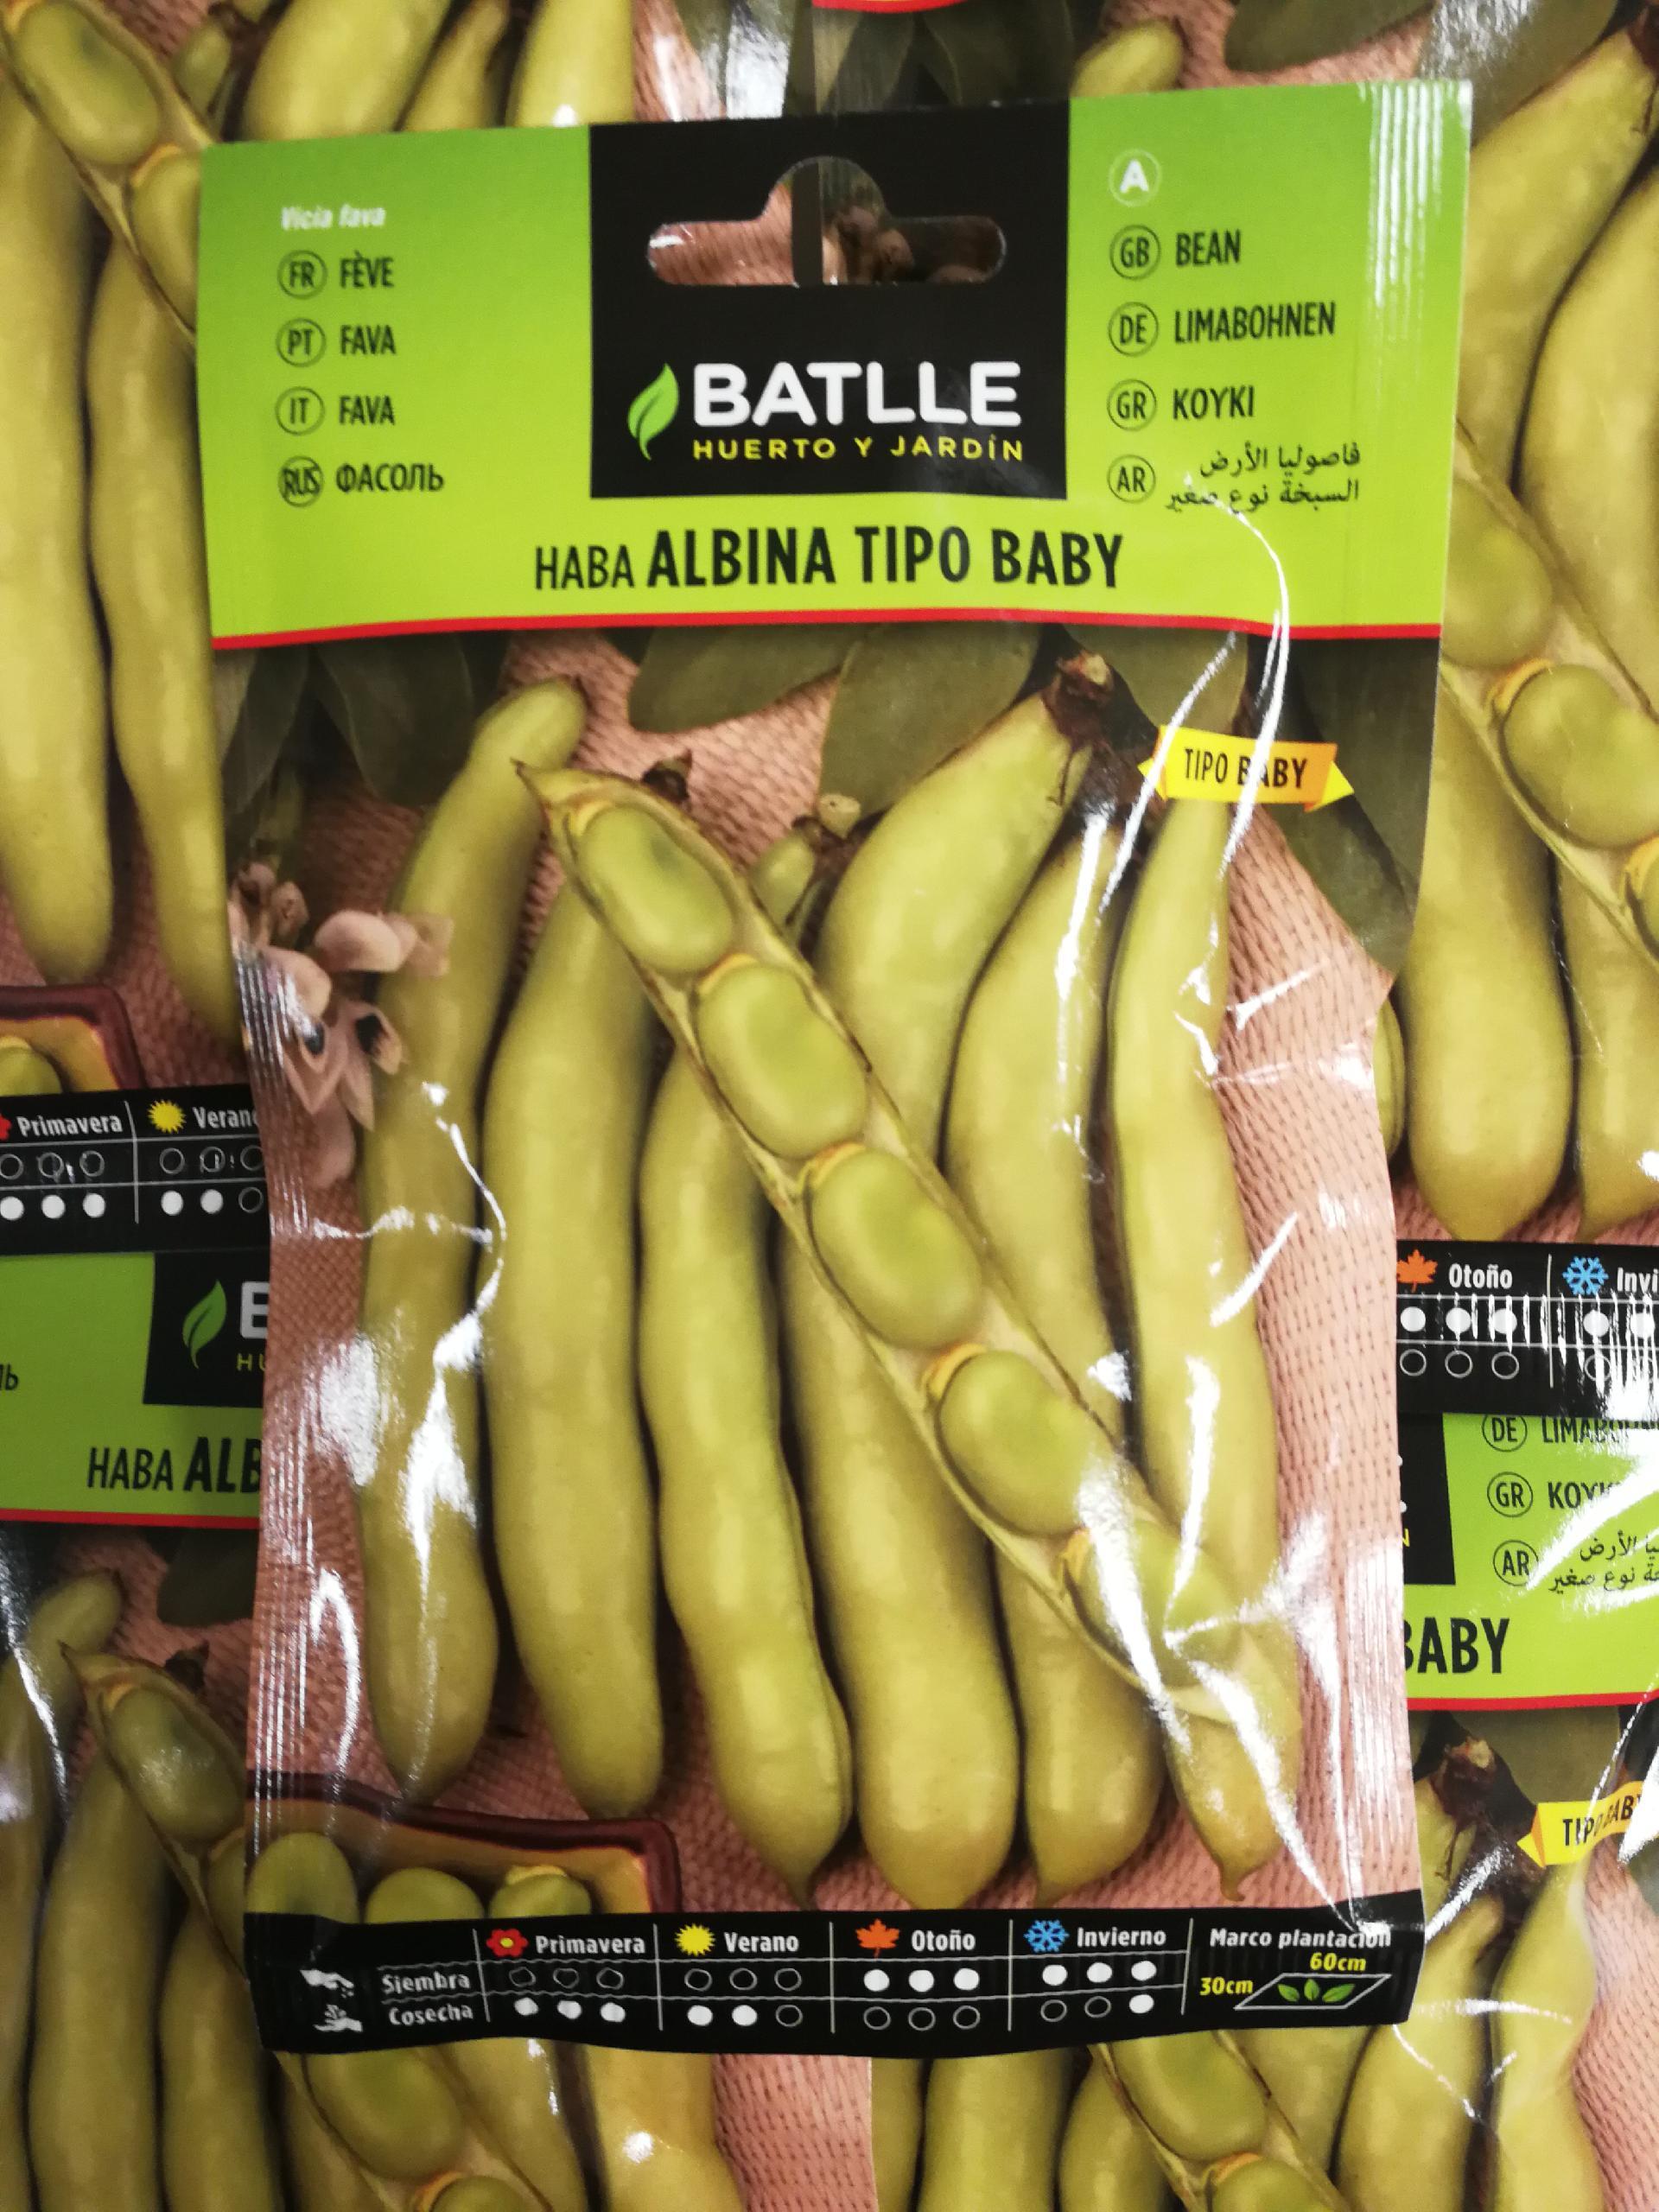 HABA ALBINA (50 gr.).